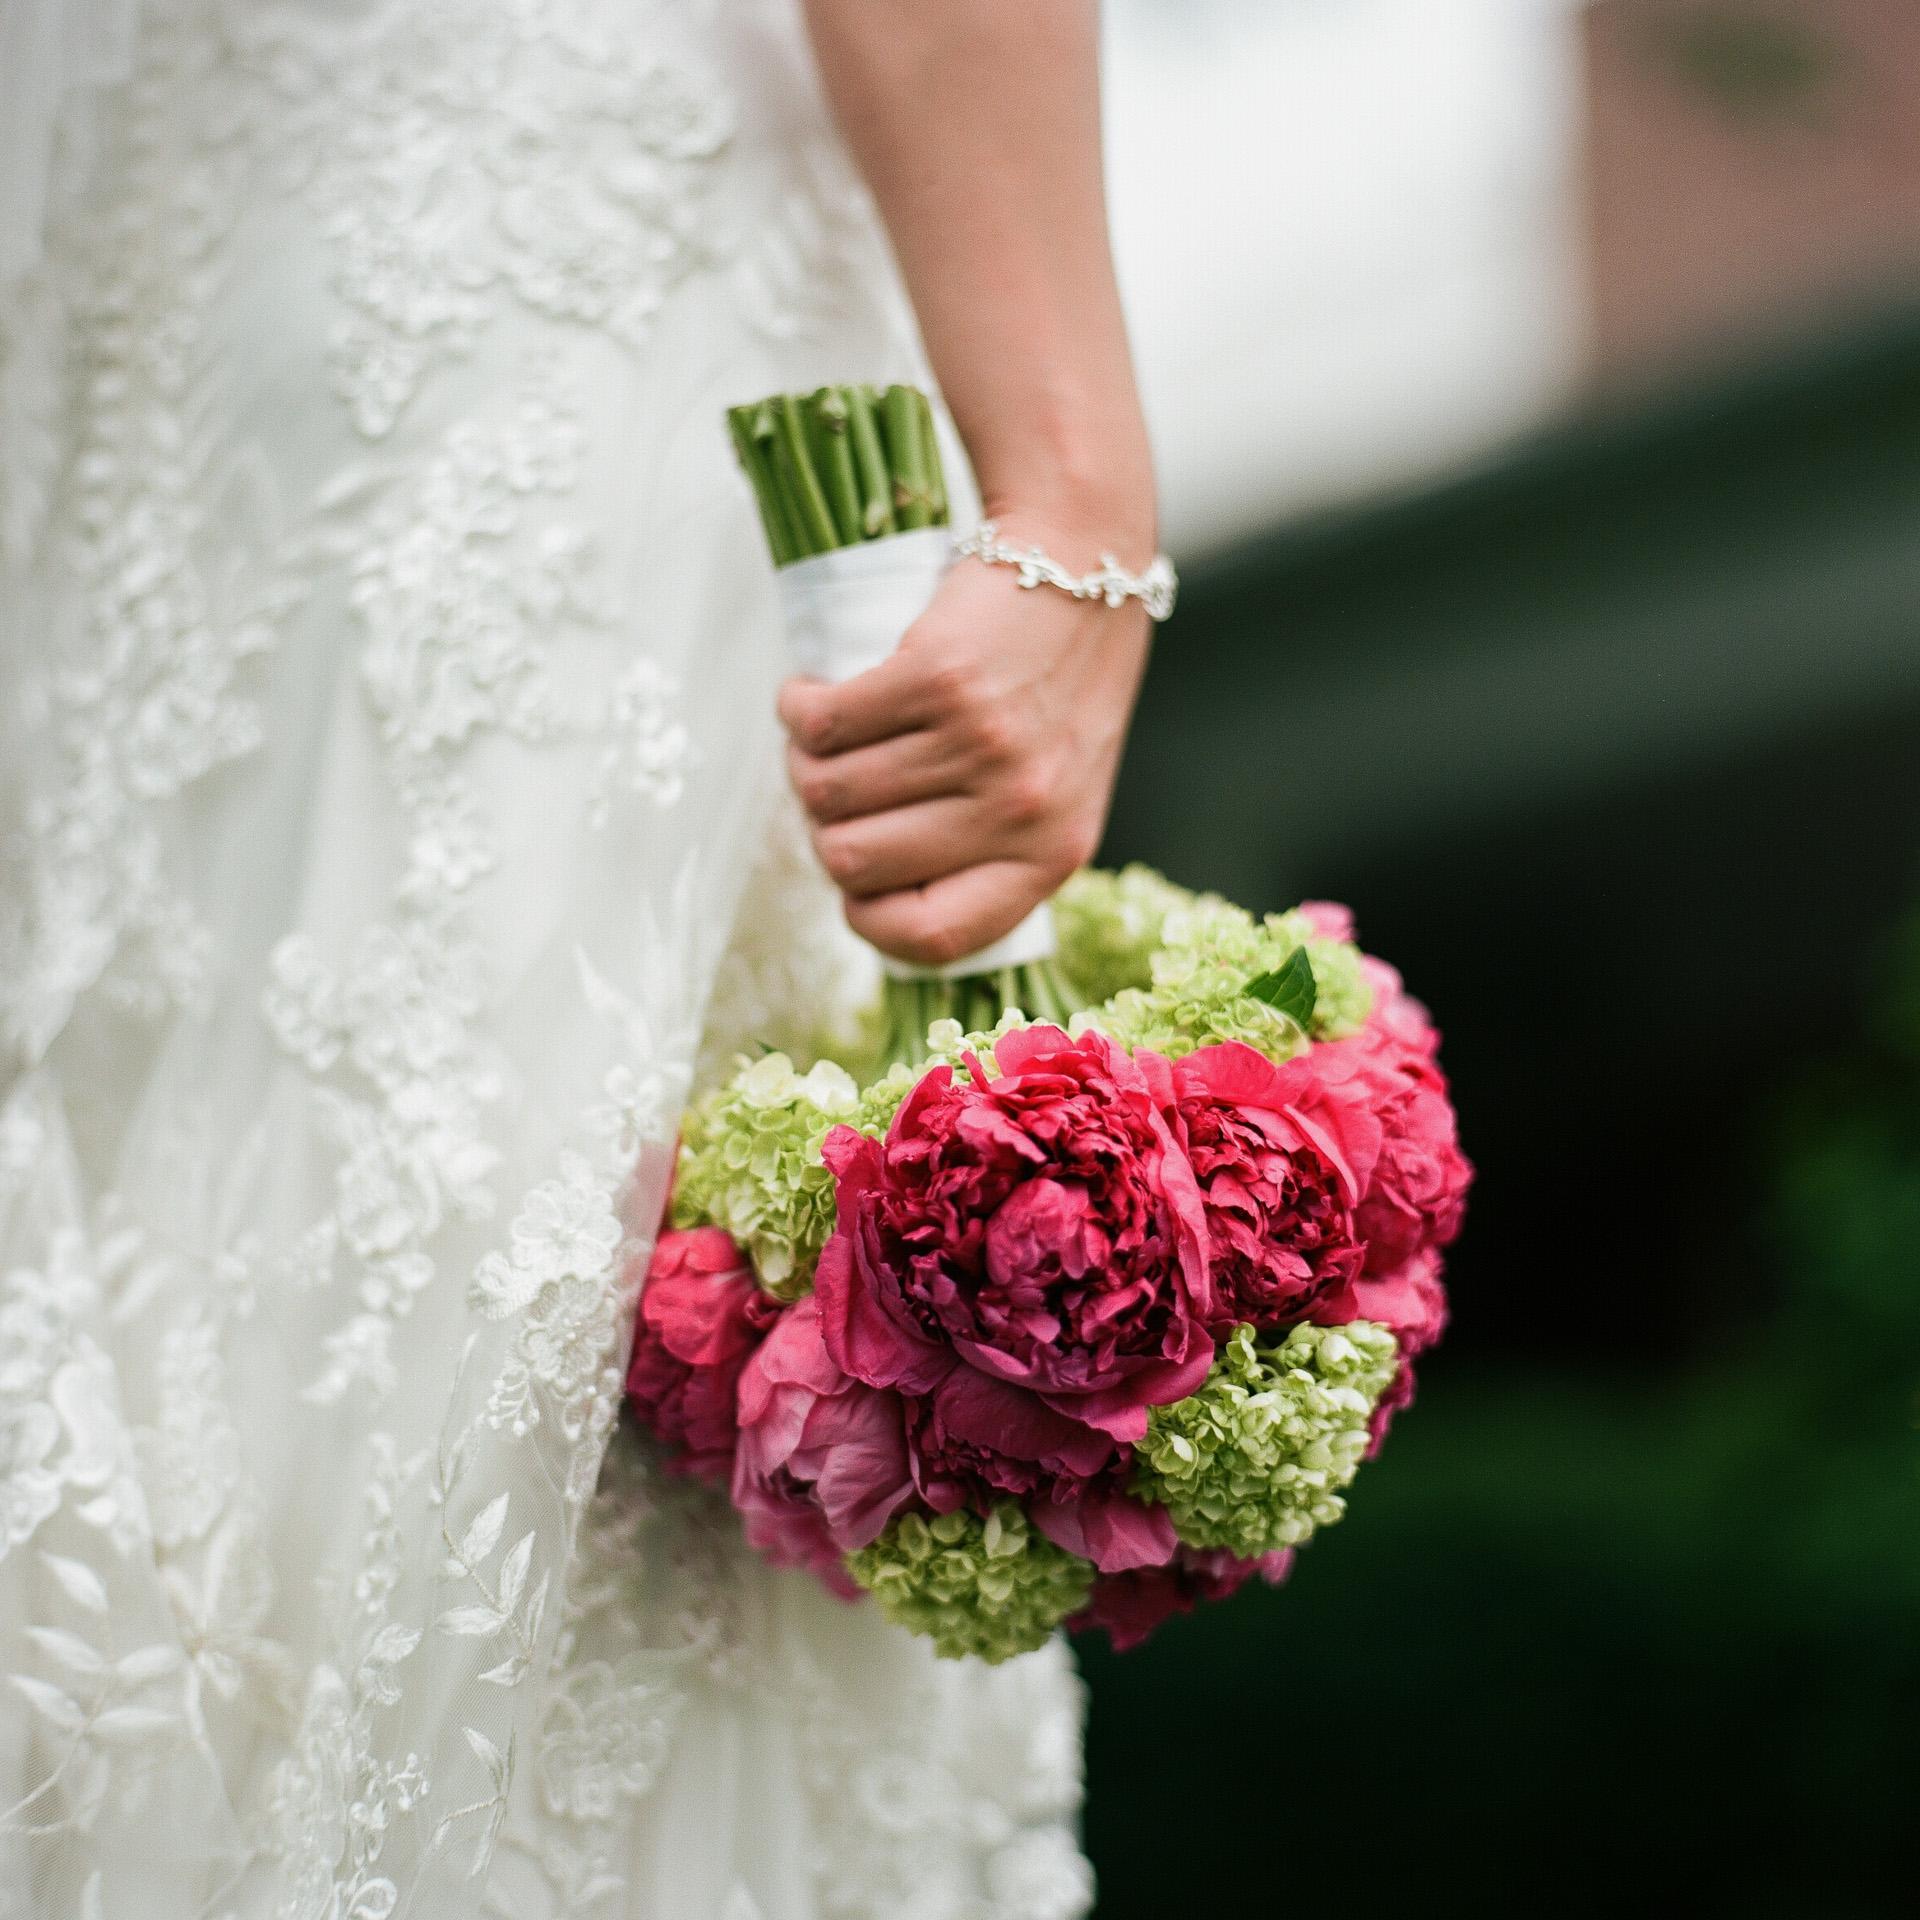 Dayton Wedding Photographer - Flowers